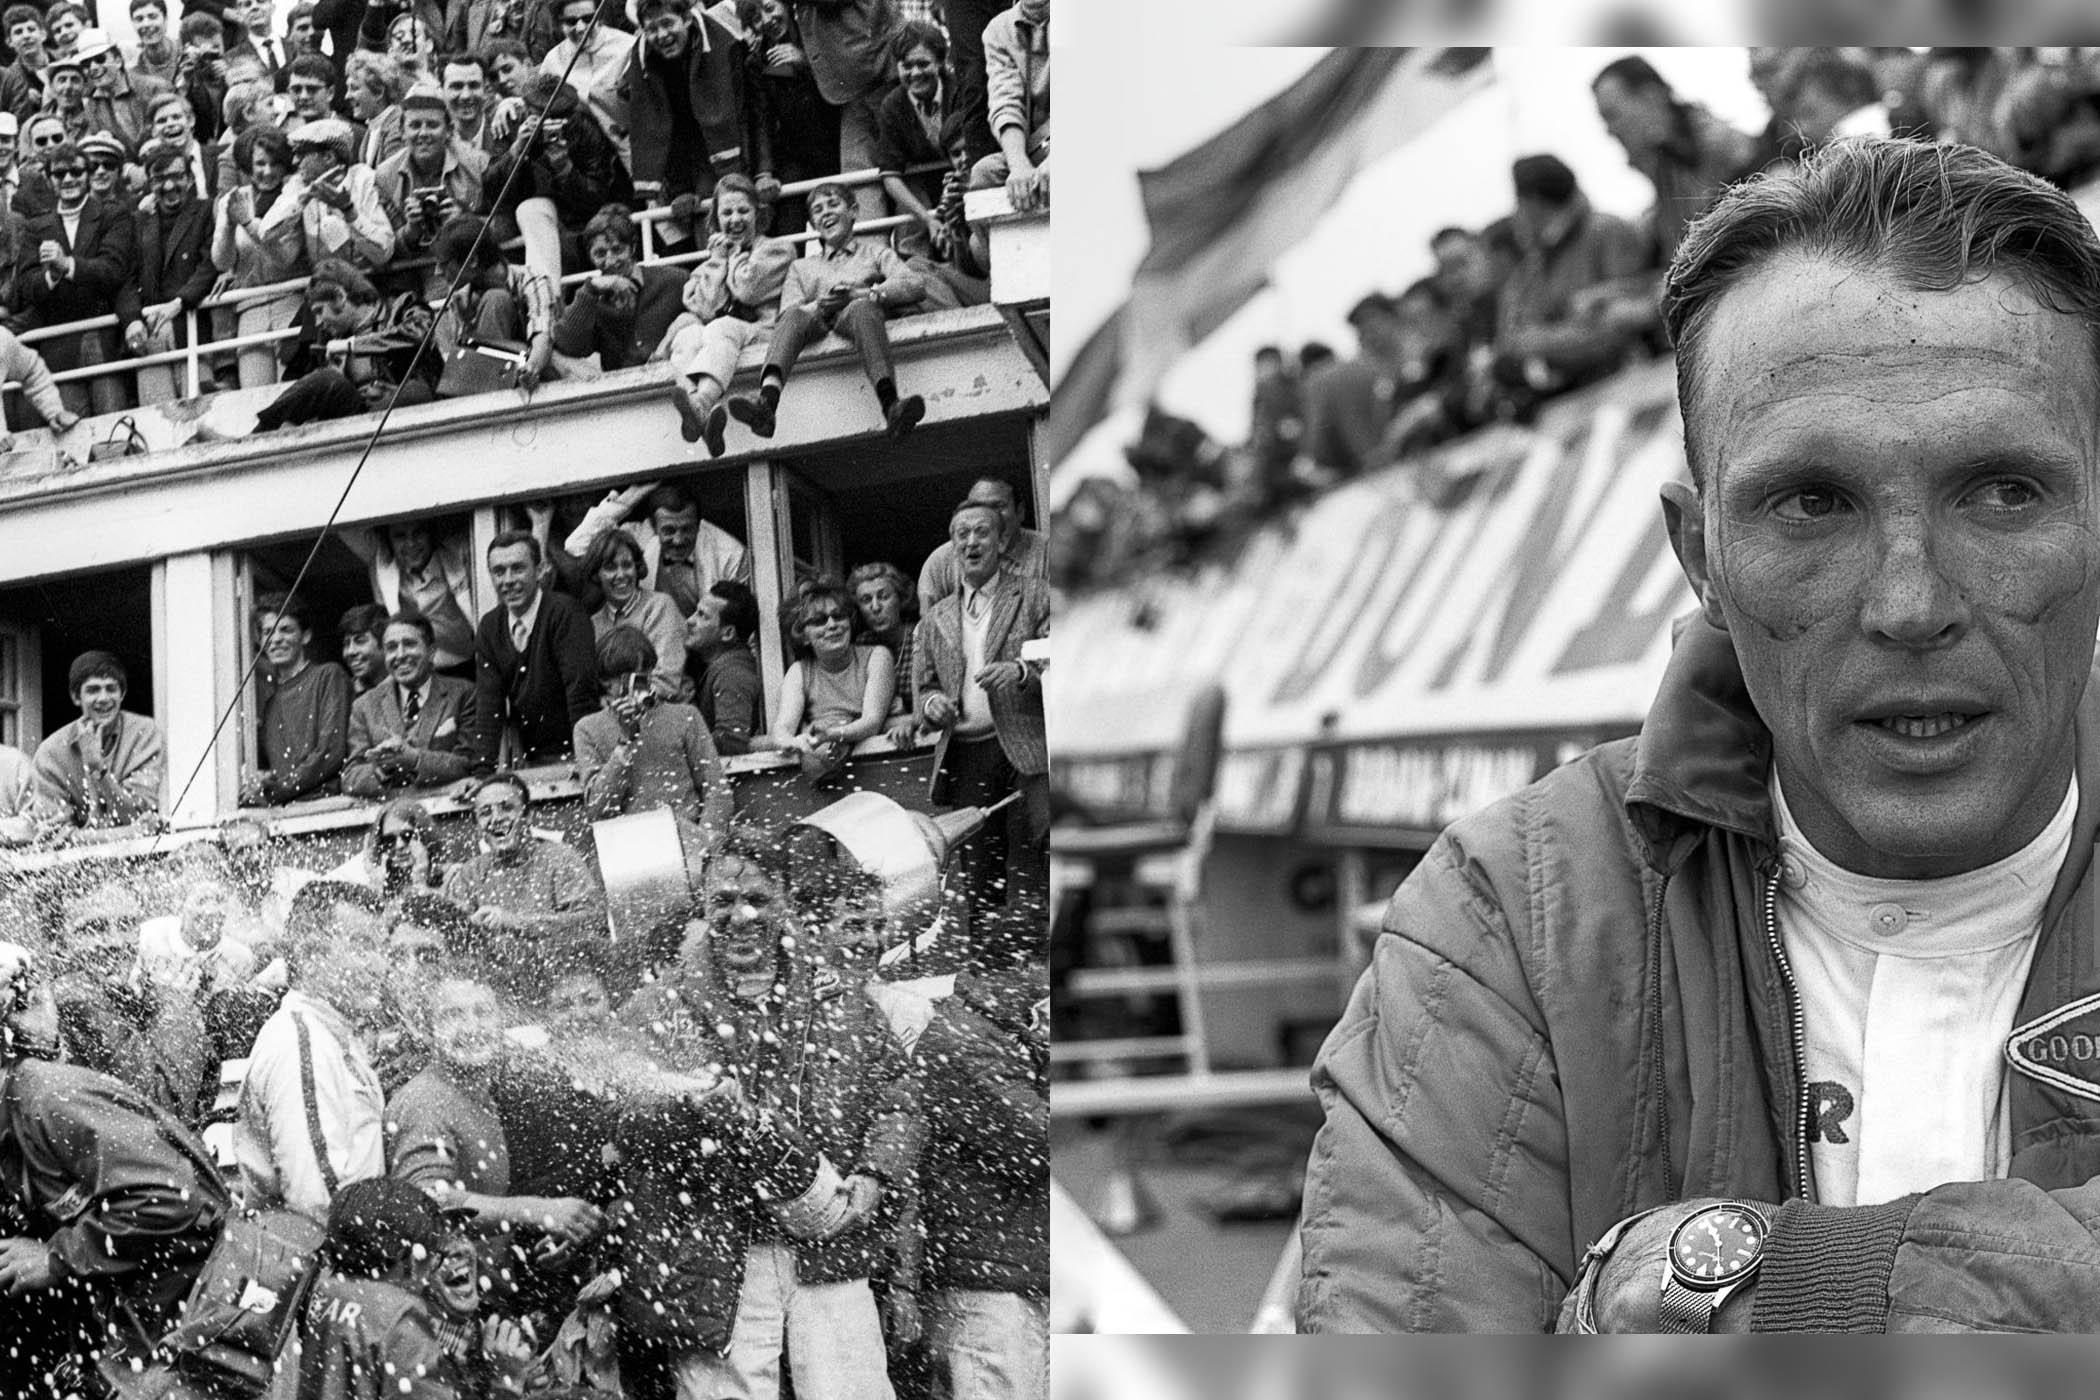 The Petrolhead Corner - Racing Driver Dan Gurney, The Original Podium Champagne Sprayer and His Breguet Diver & Rolex 6234